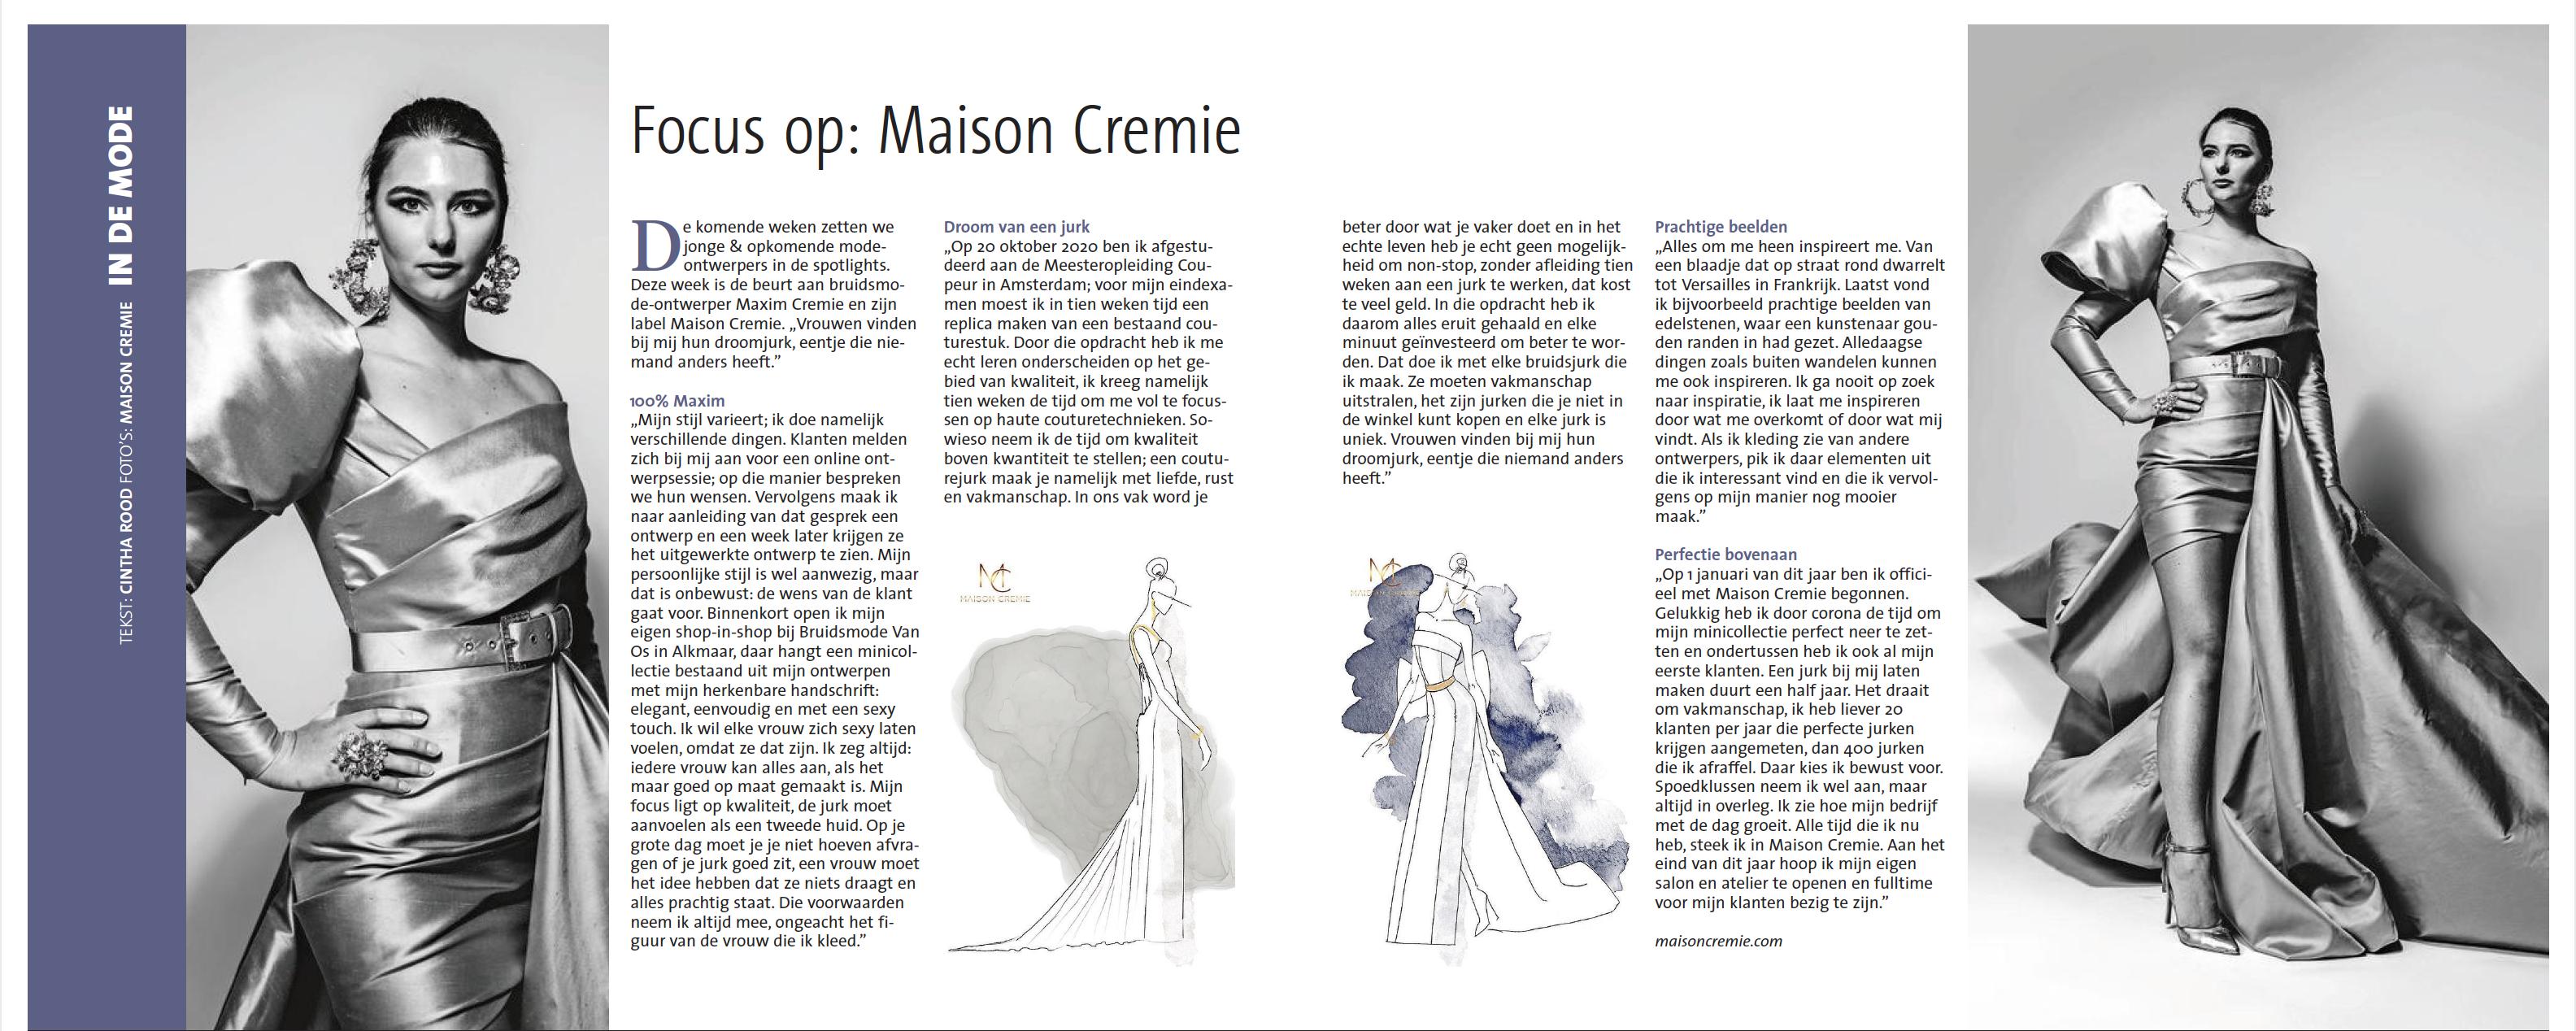 Maison Cremie in het NH dagblad